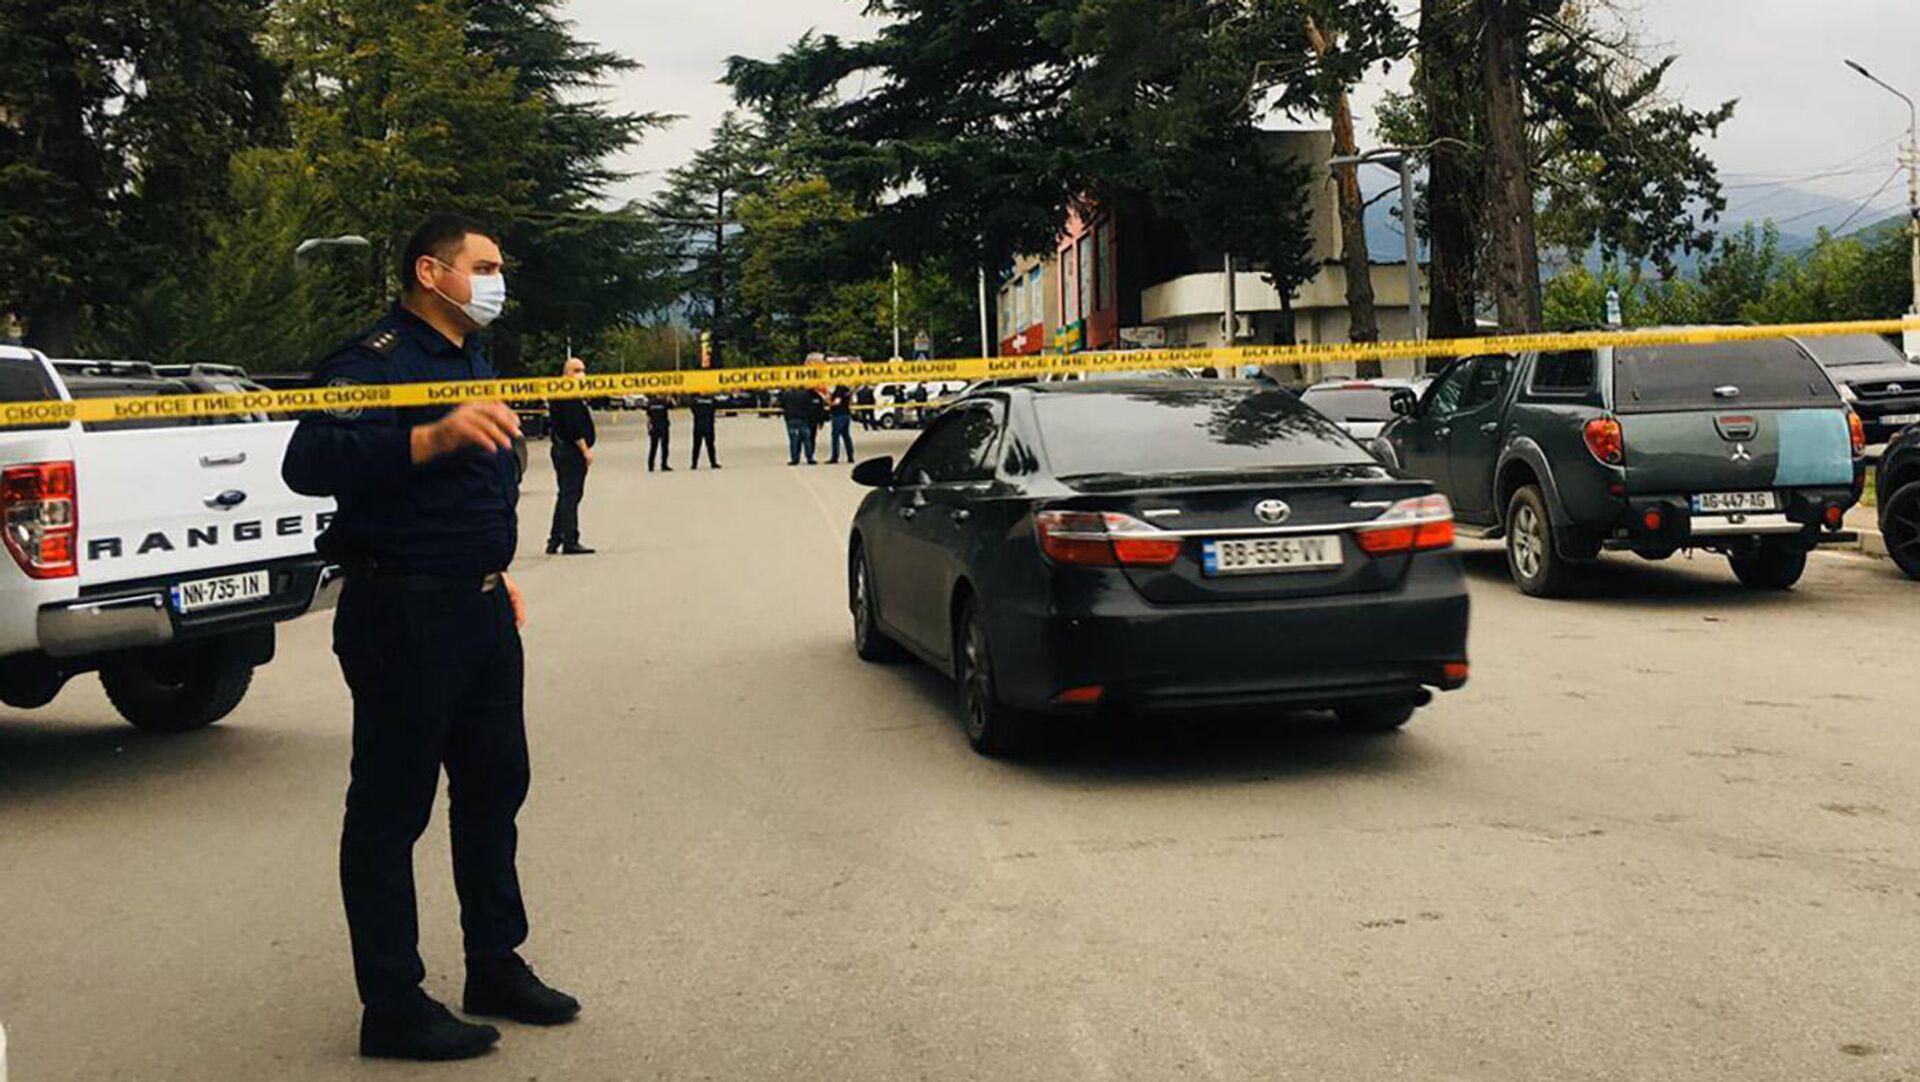 Полиция на месте нападения на филиал Банка Грузии в городе Кварели - Sputnik Грузия, 1920, 09.09.2021